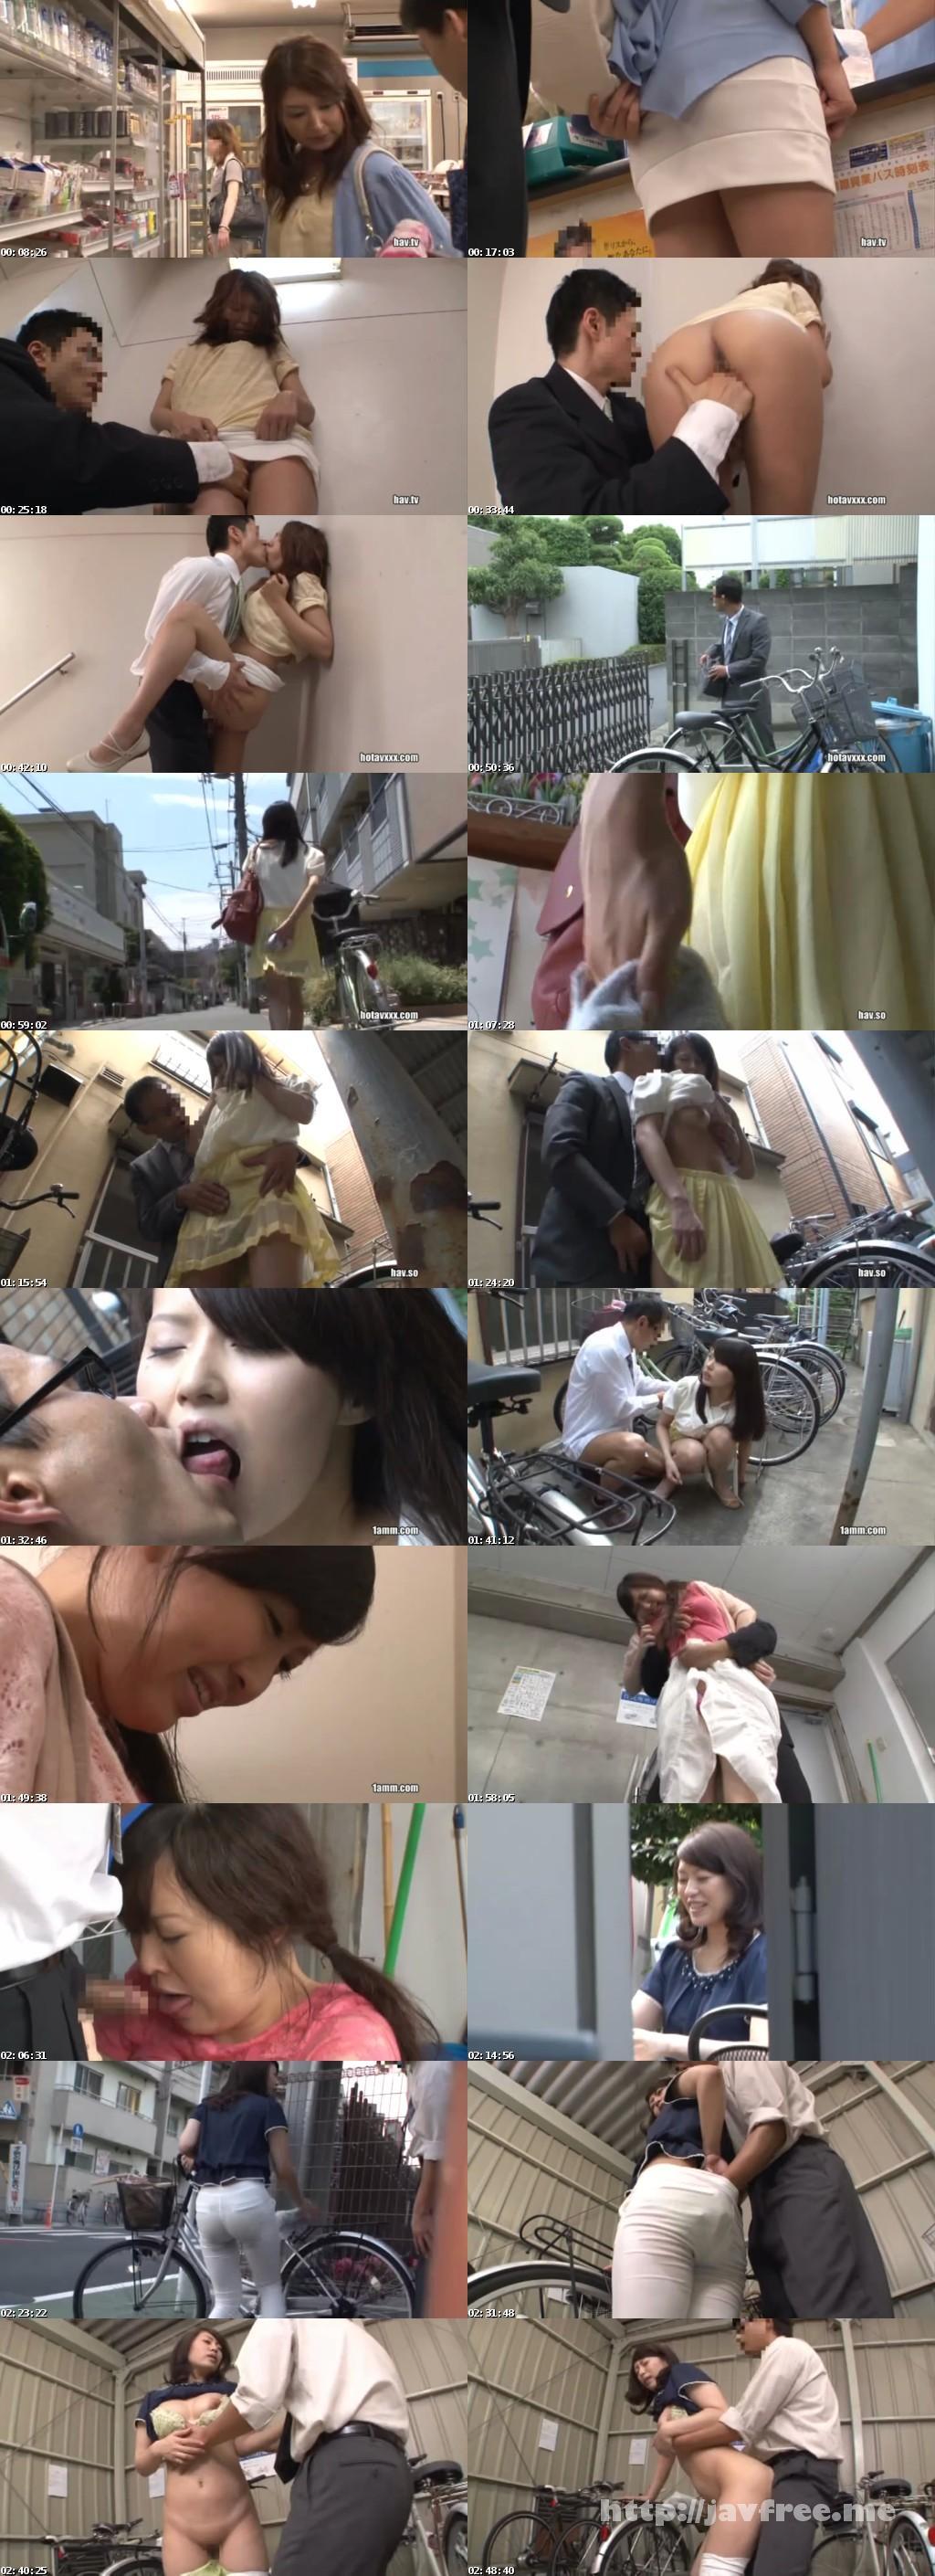 [DANDY 349] 「『サドルに穴を空けて水を入れたのは誰…』ママチャリで移動中の恥ずかしい濡れ尻を見られた専業主婦はヤられても拒めない」 VOL.1 DANDY